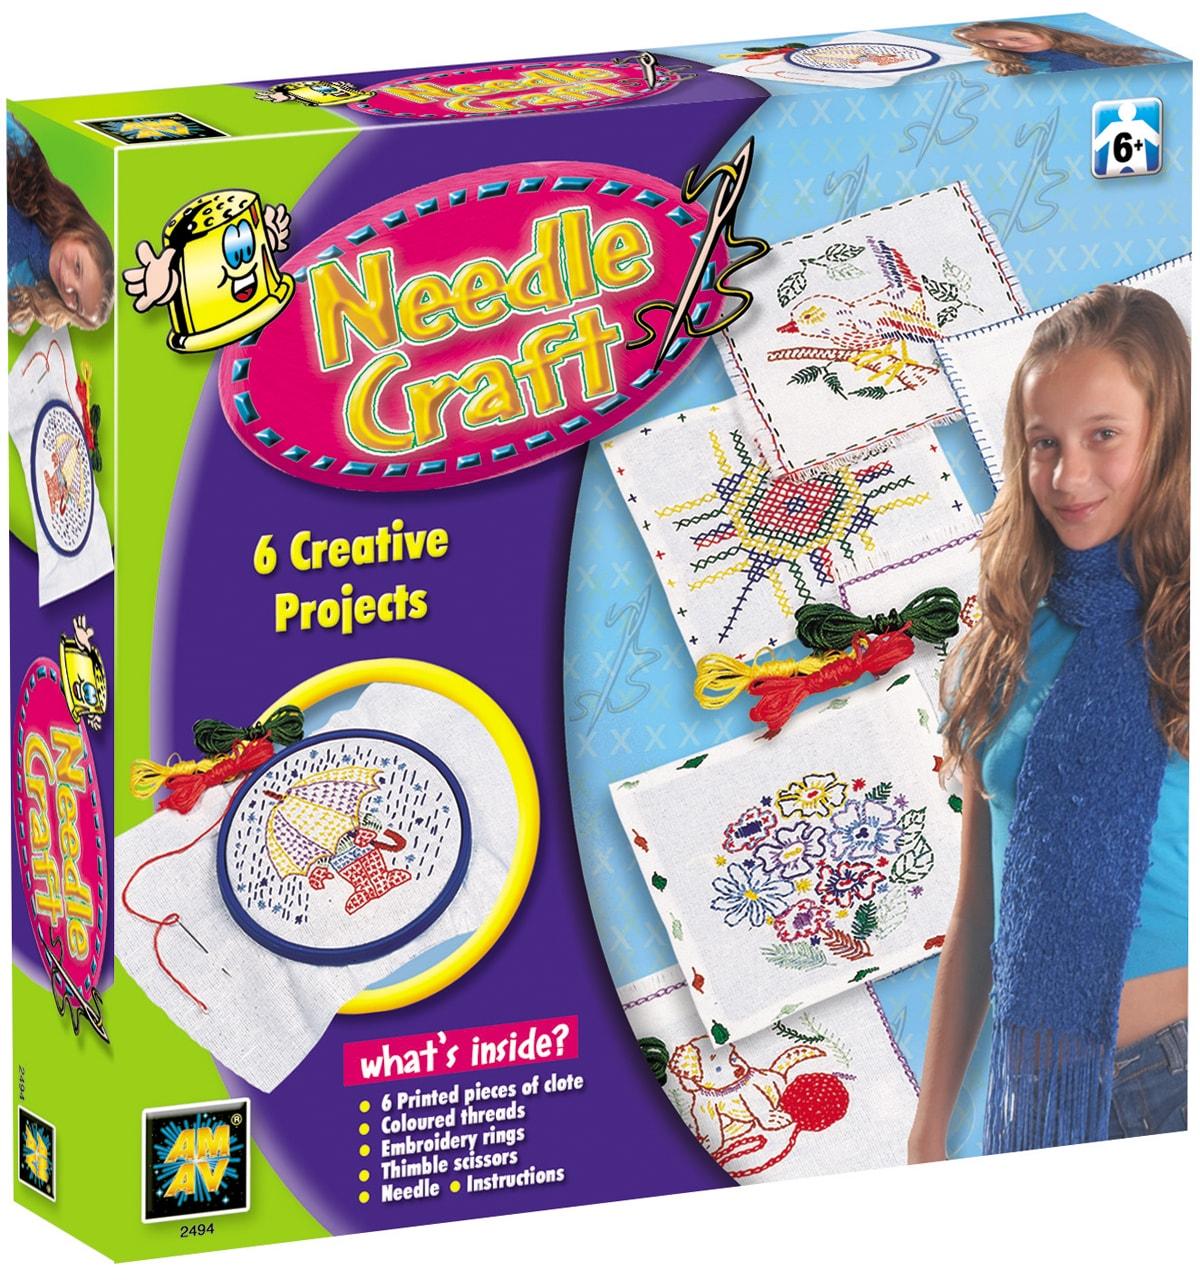 Needle Craft Kit